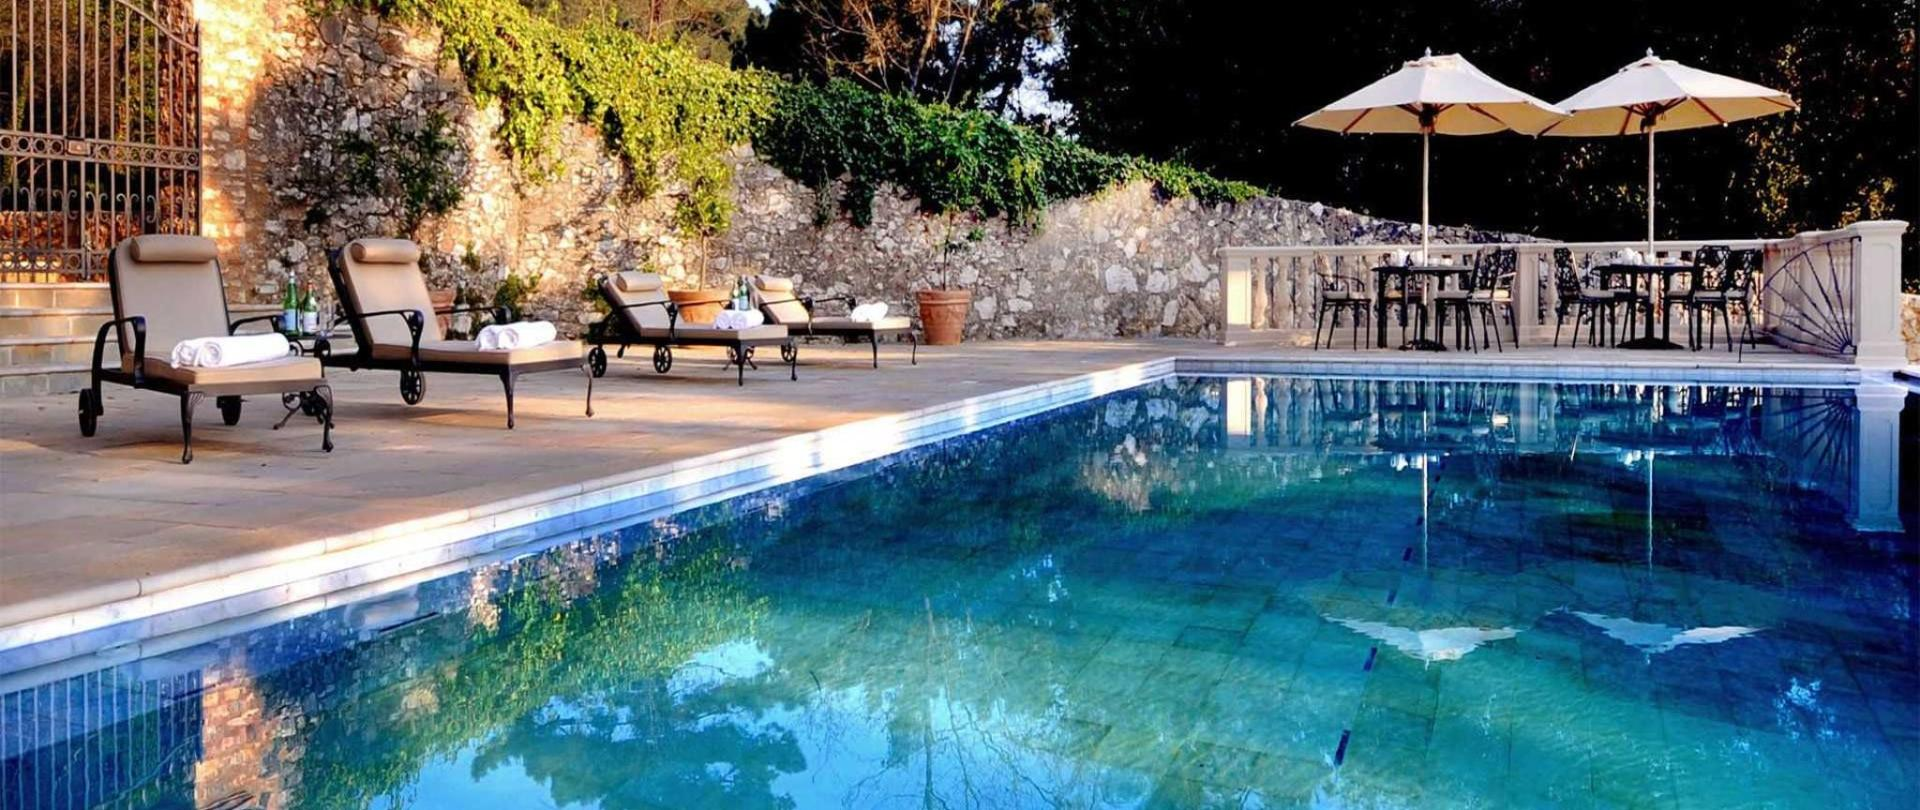 Villa Casanova Swimming Pool